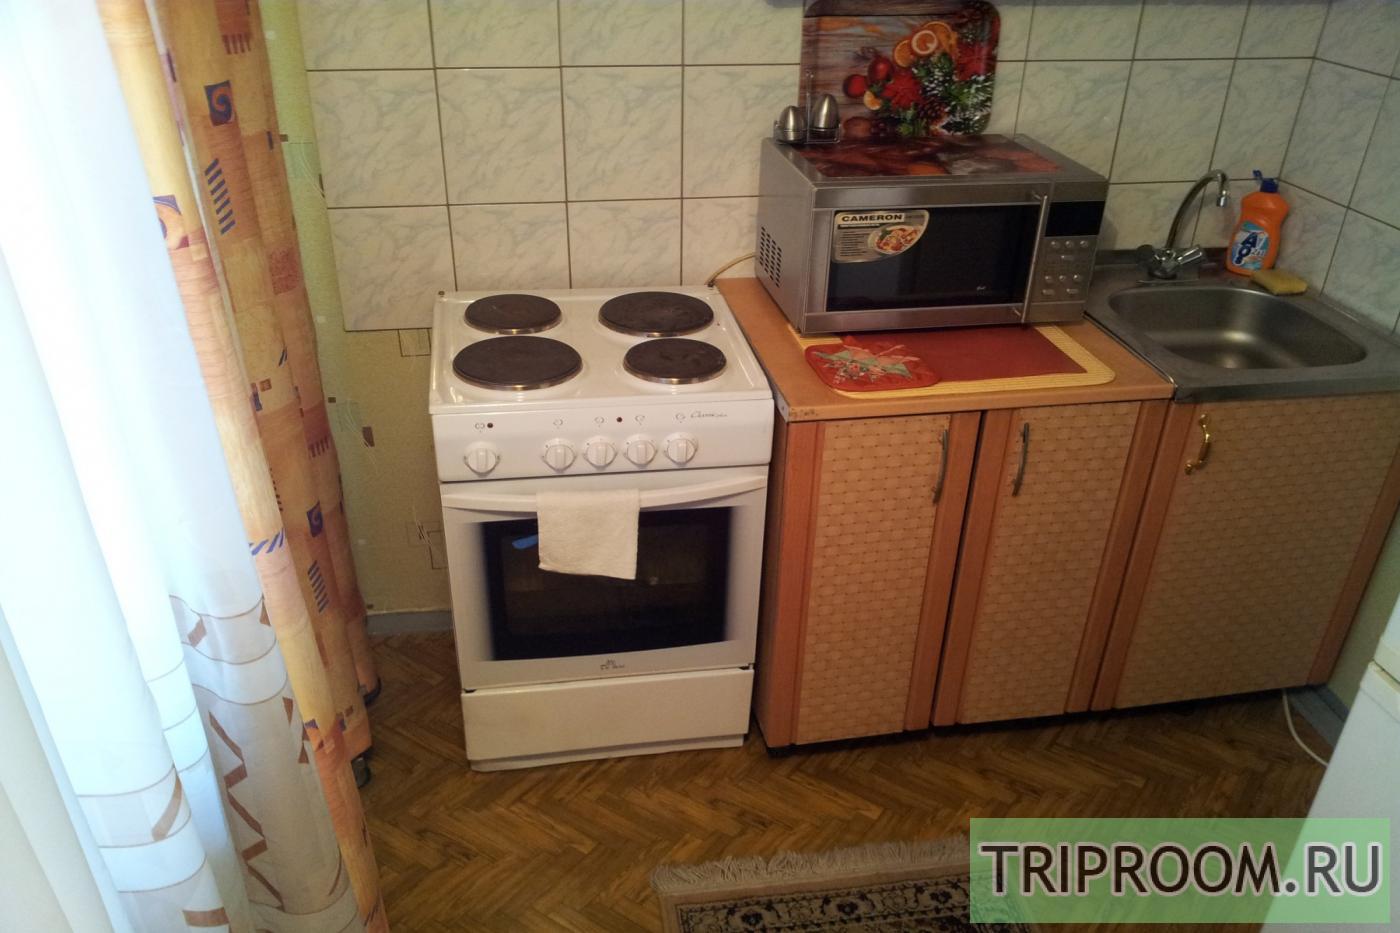 1-комнатная квартира посуточно (вариант № 30851), ул. Циолковского улица, фото № 4